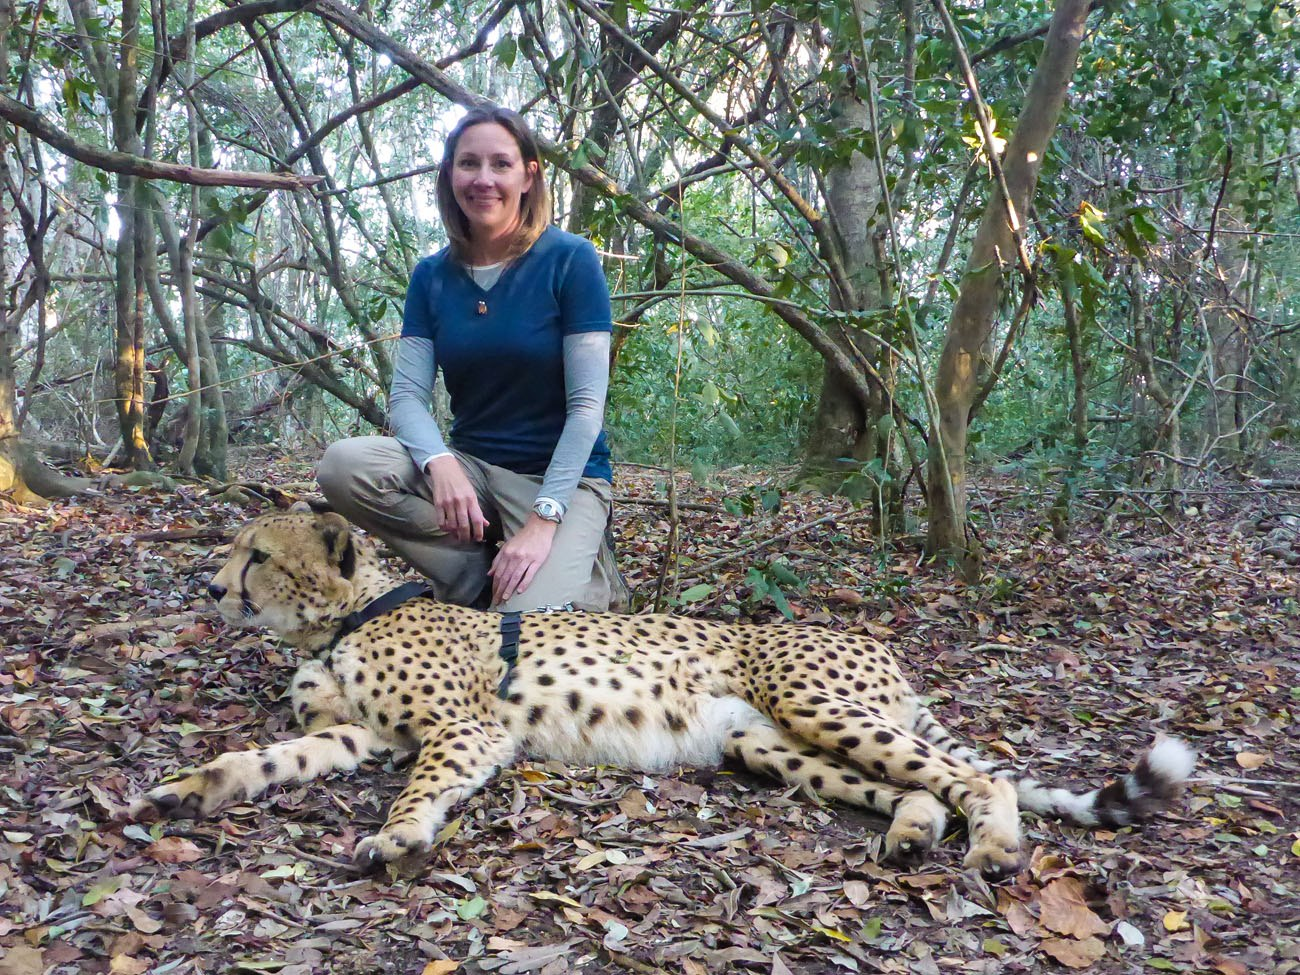 Julie and Cheetah